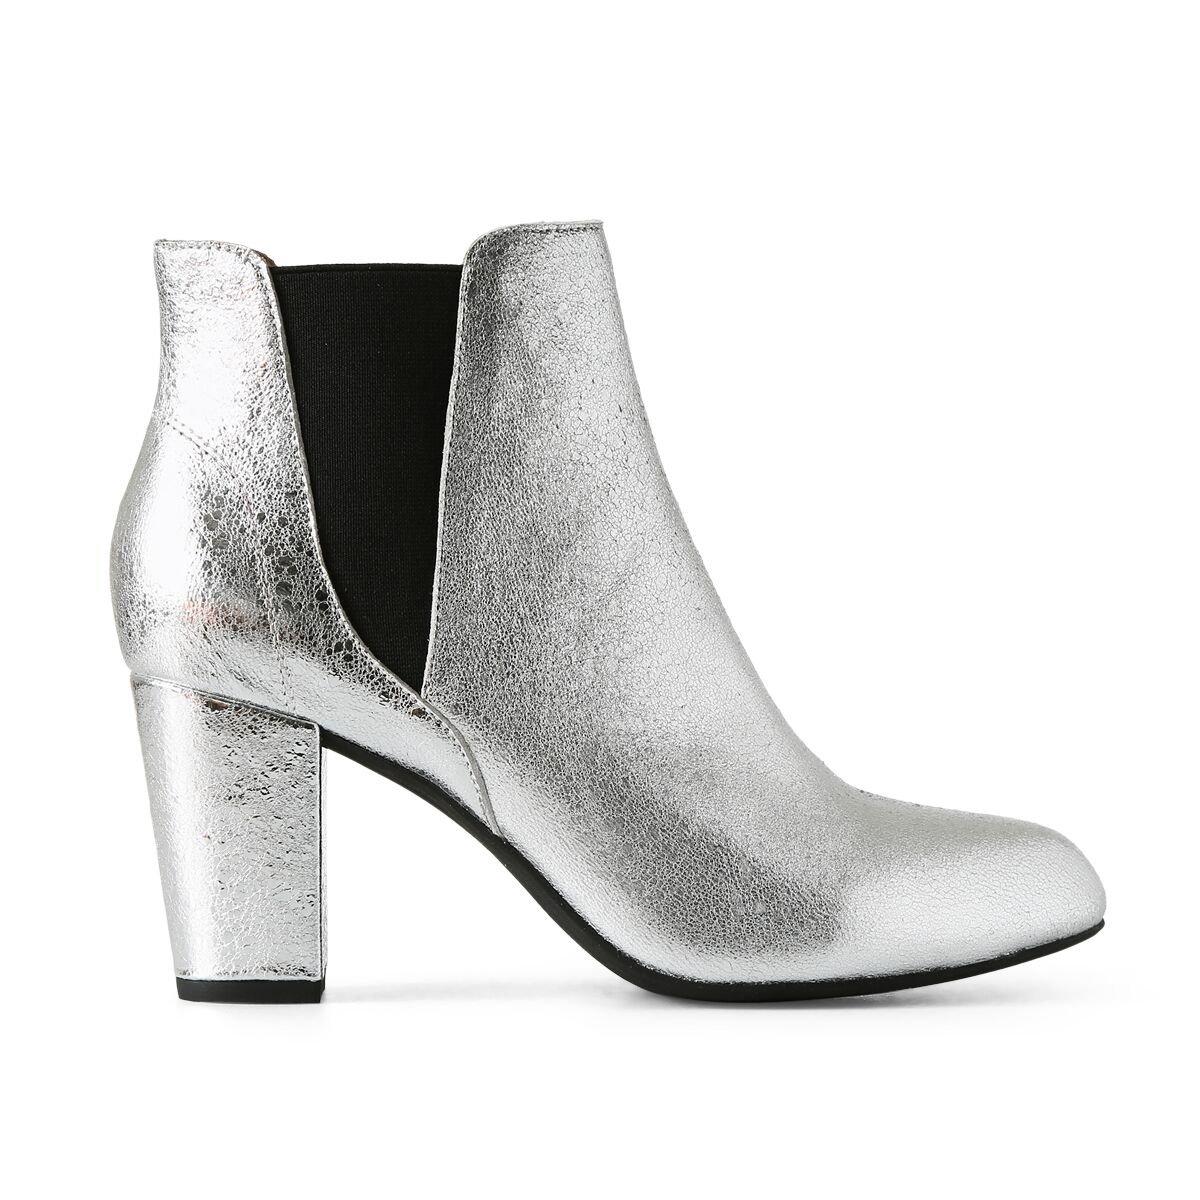 The Shoe LBottines Eu Hannah Bear FemmeArgentésilver 21038 GqSpUzMV